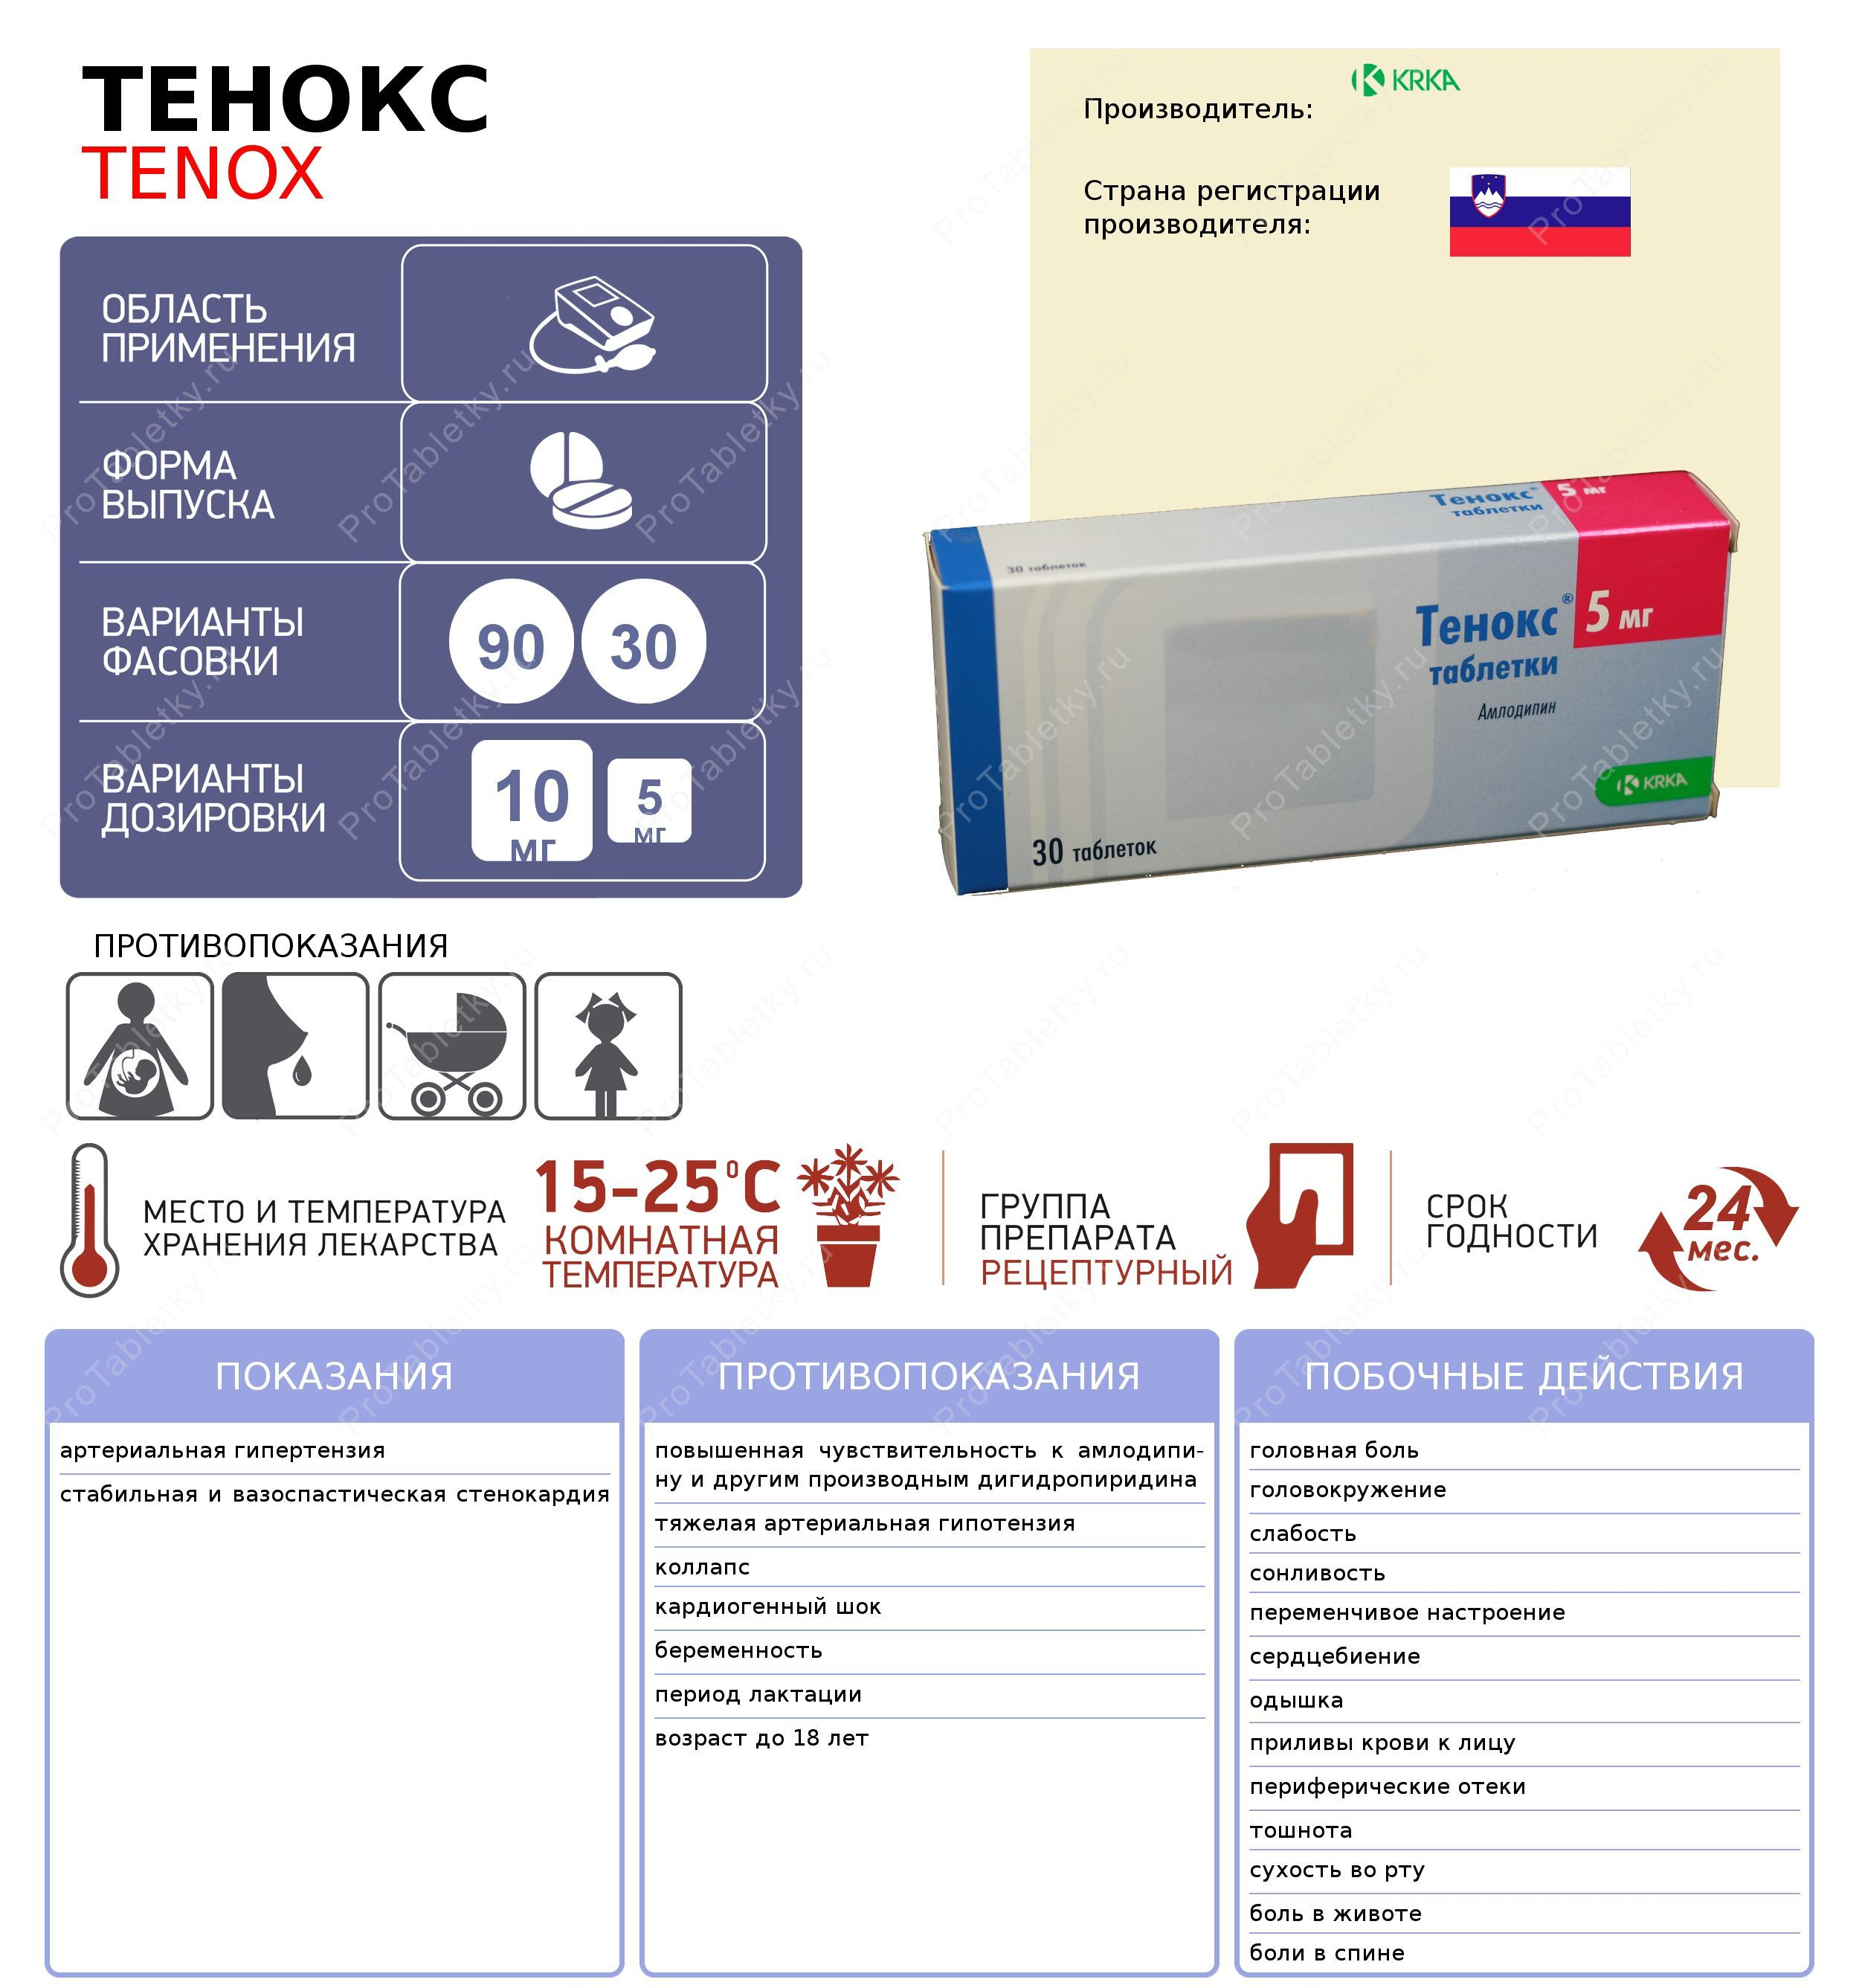 Olicard 40 mg retard kemény kapszula